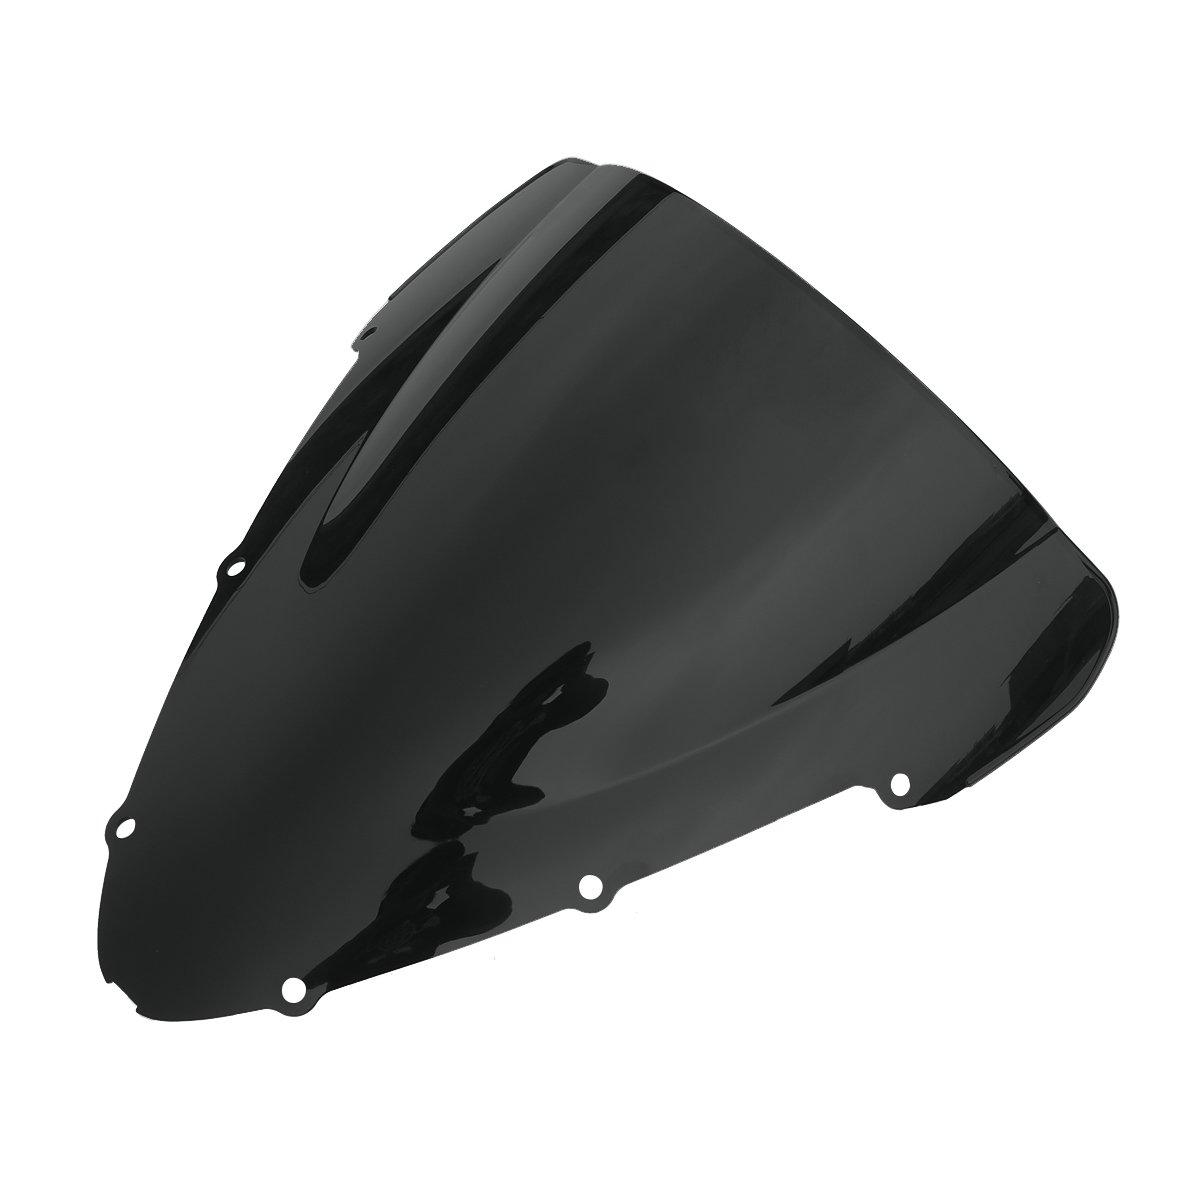 XMT-MOTO Black Windshield Windscreen For Honda CBR600 F4I 2001 2002 2003 2004 2005 2006 2007 2008